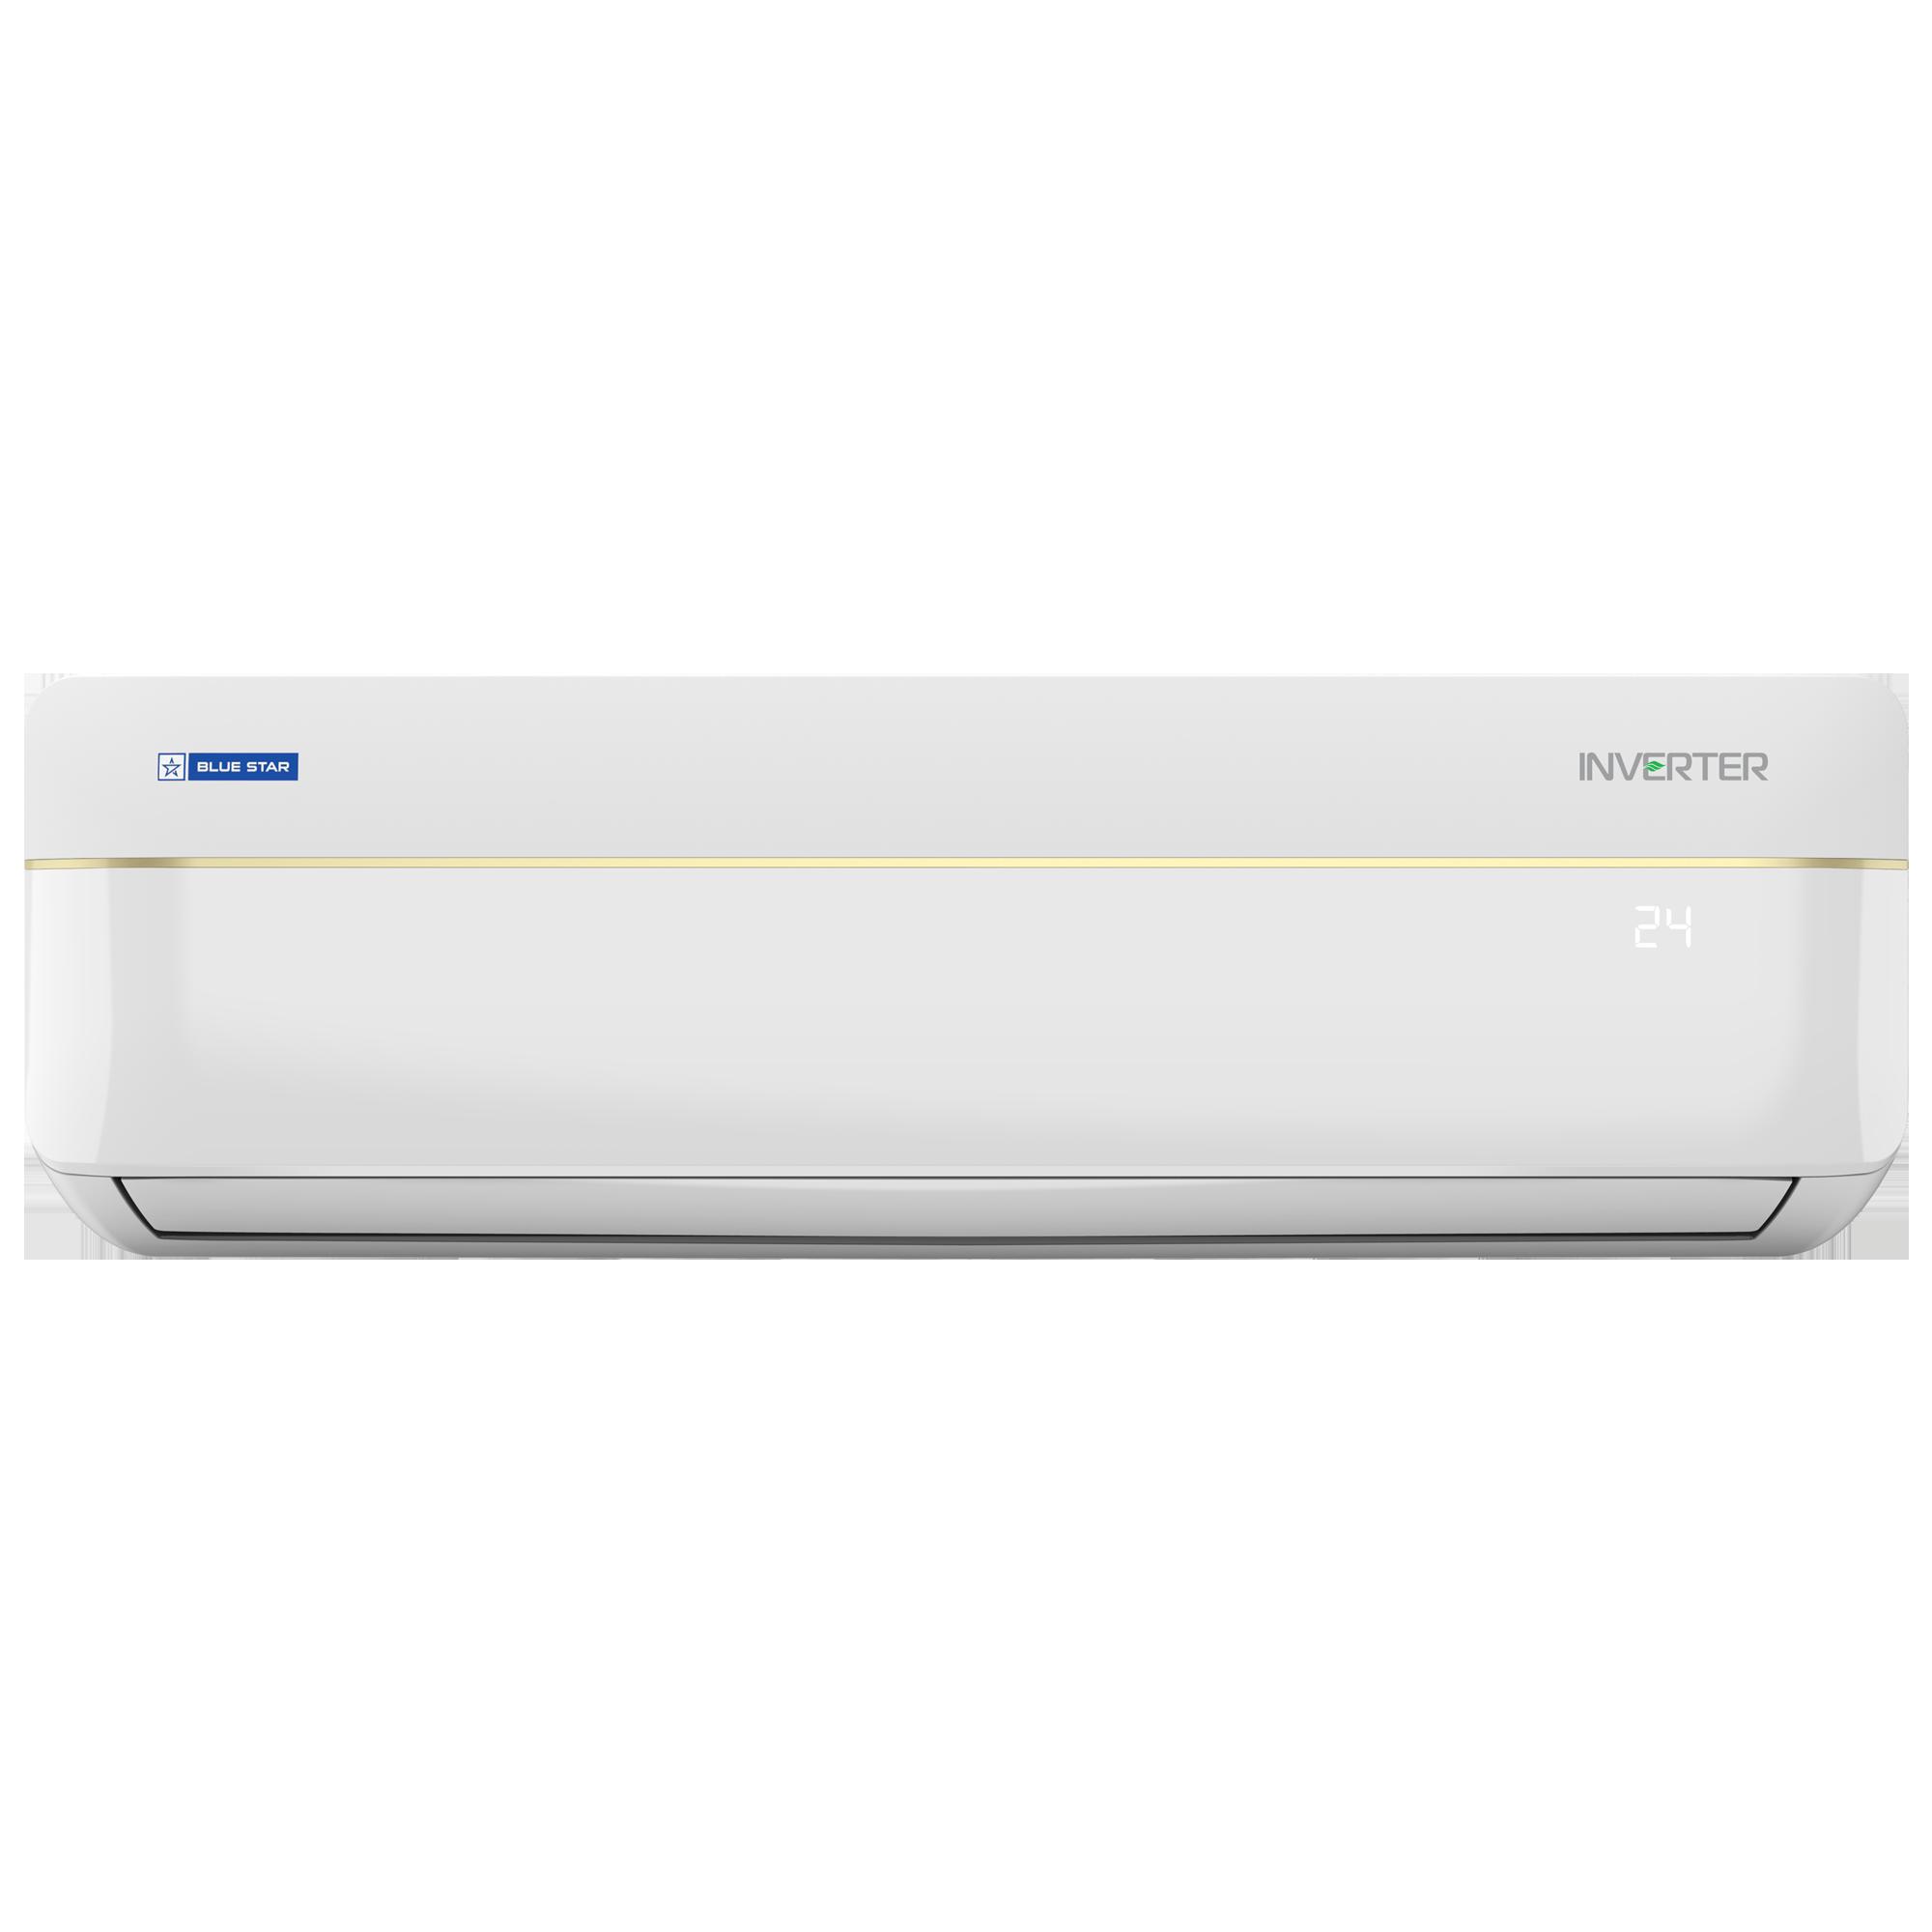 Blue Star VL LV 1.5 Ton 3 Star Inverter Split AC (Air Purification Function, Copper Condenser, IC318VLTULV, White)_1